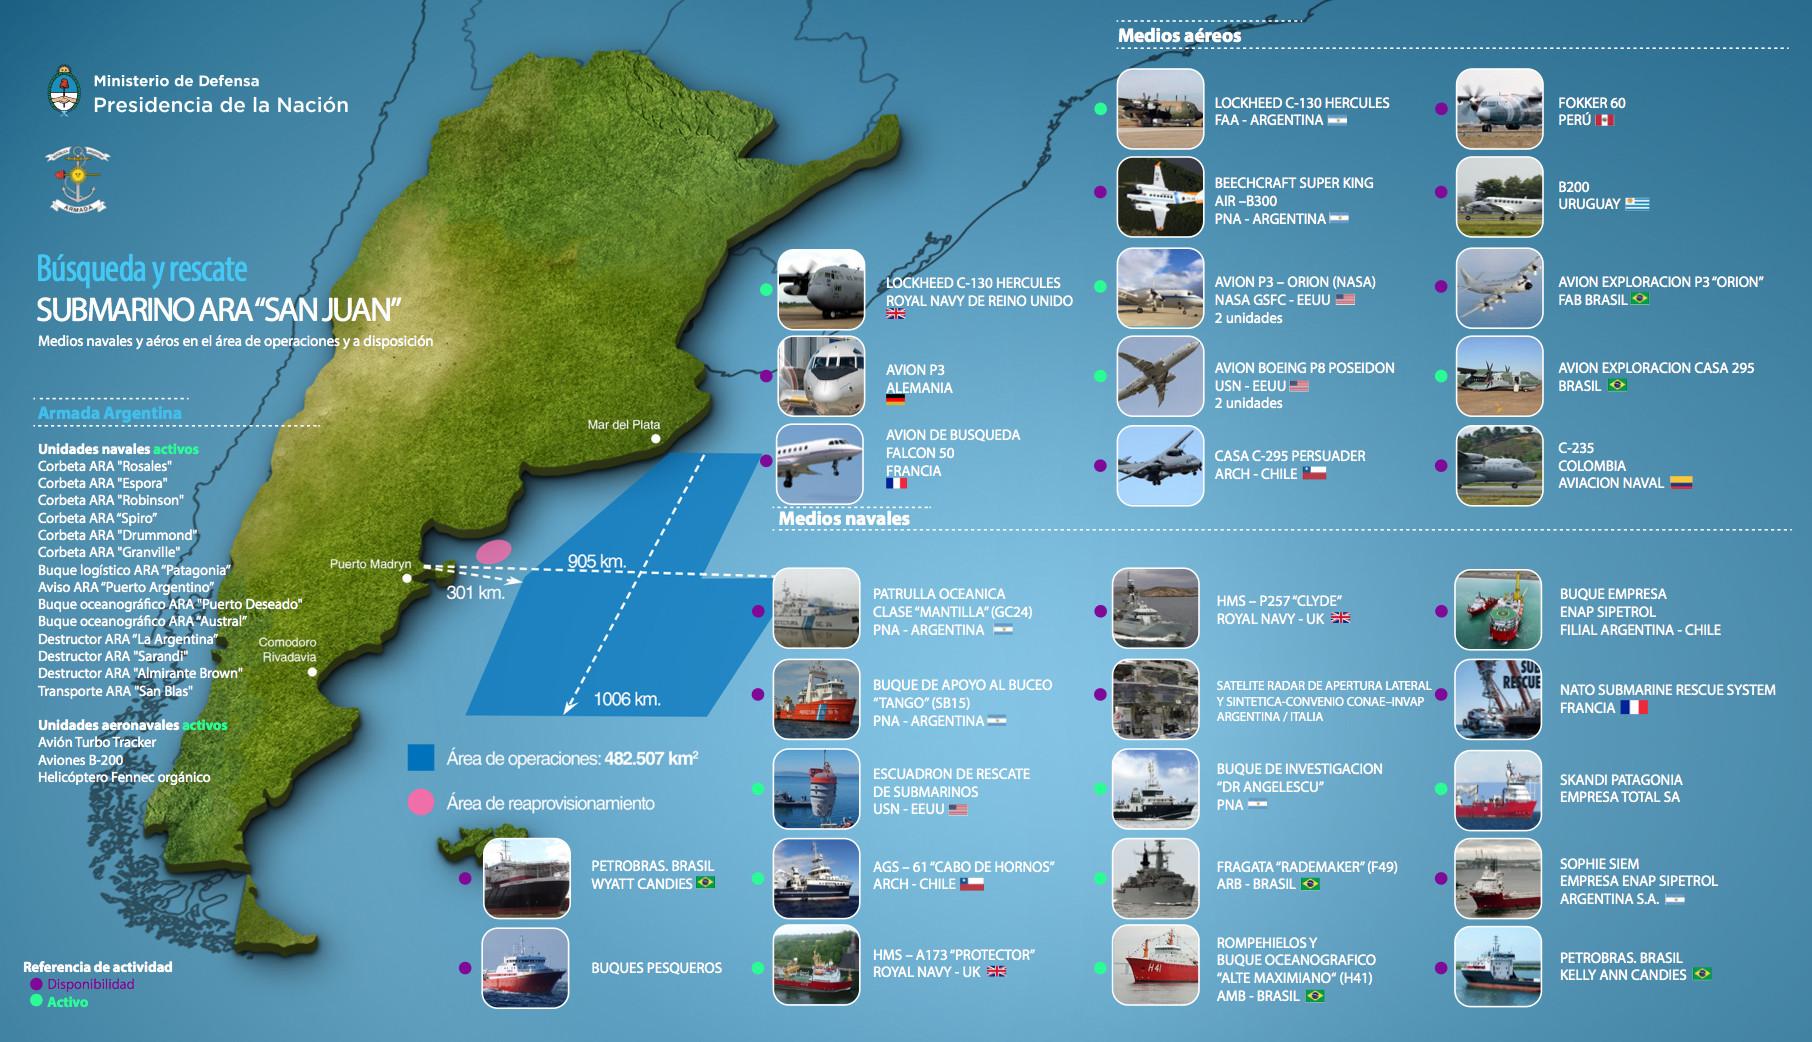 Ara San Juan, el ahora olvidado submarino Argentino desaparecido con 44 tripulantes a bordo 5a15dd03e9180f1f148b4567